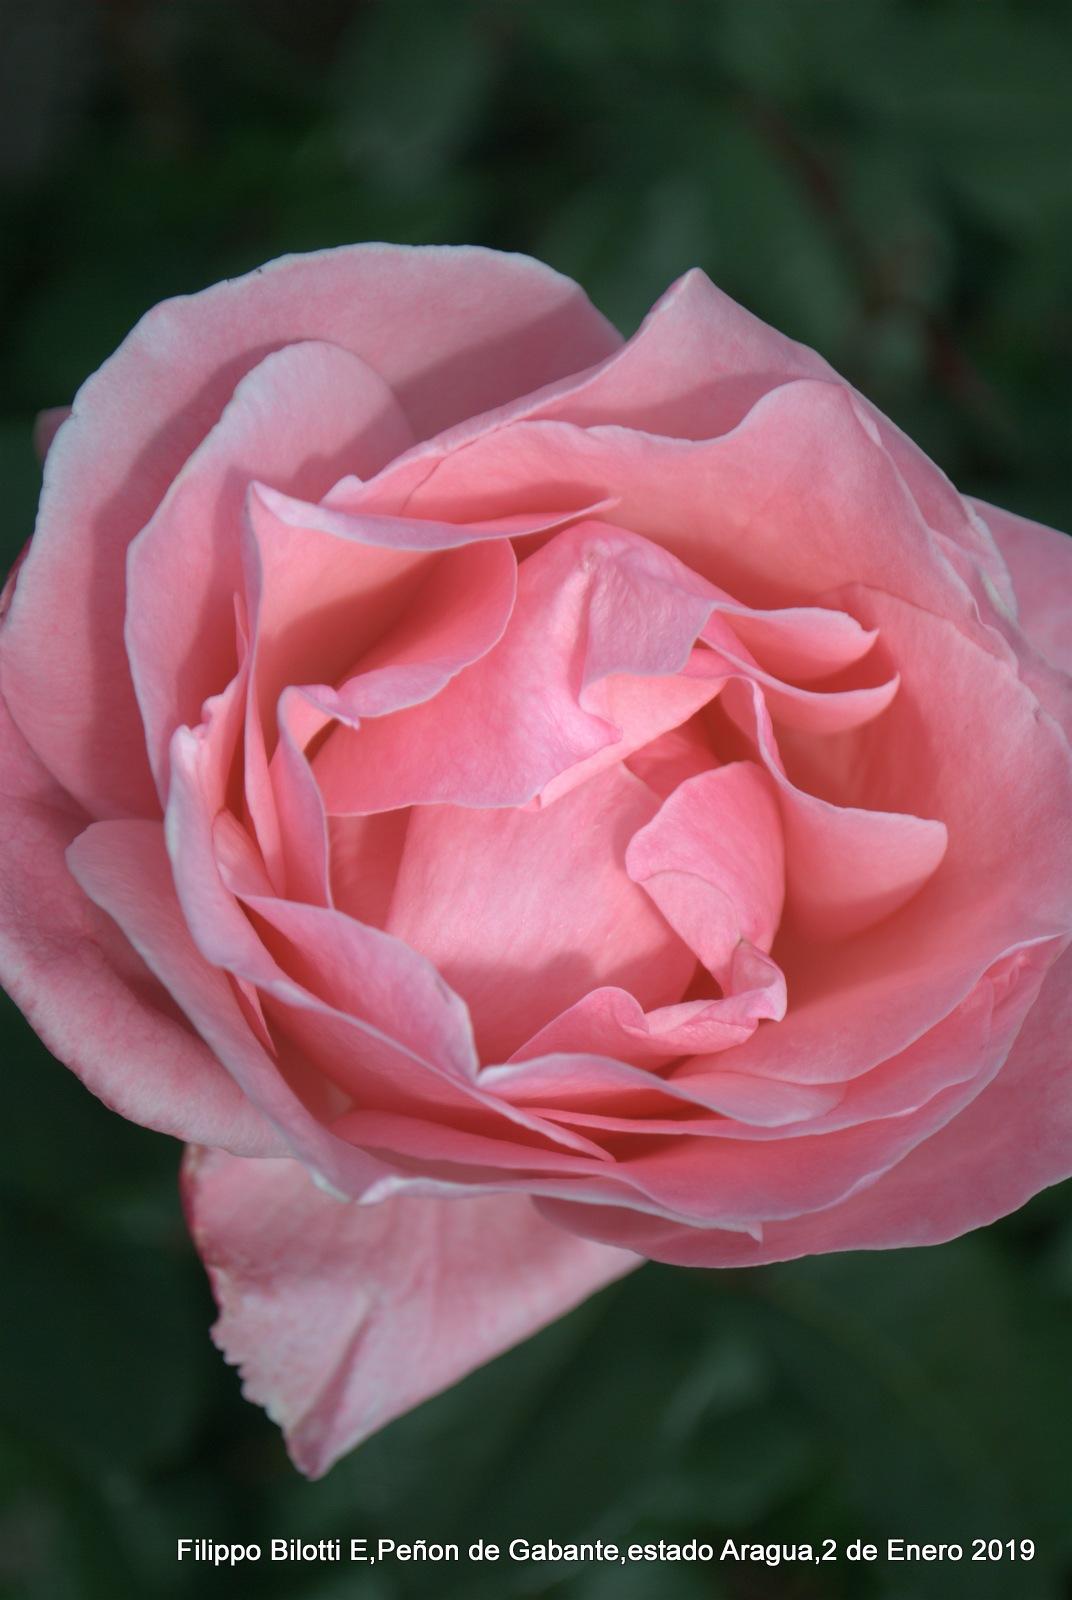 Rosada desde arriba. by FilippoBilottiE